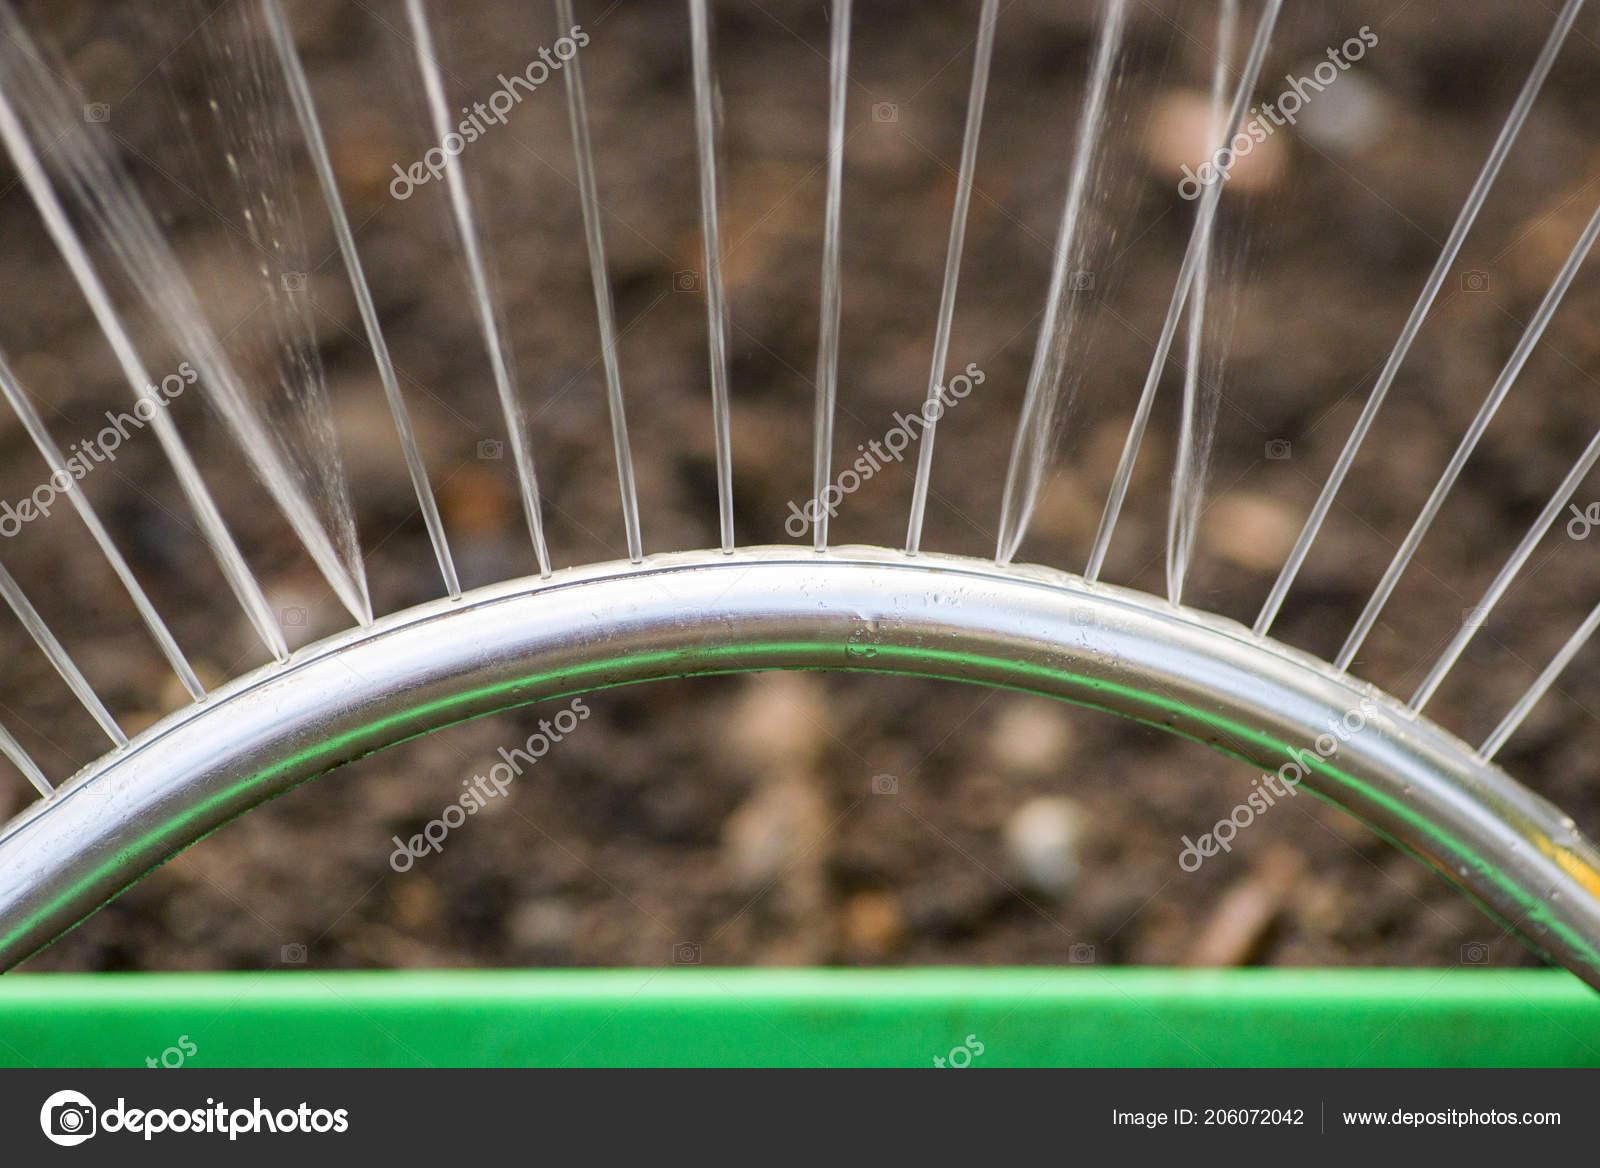 Garden Automatic Irrigation System Spray Watering Lawn Sprinkler ...